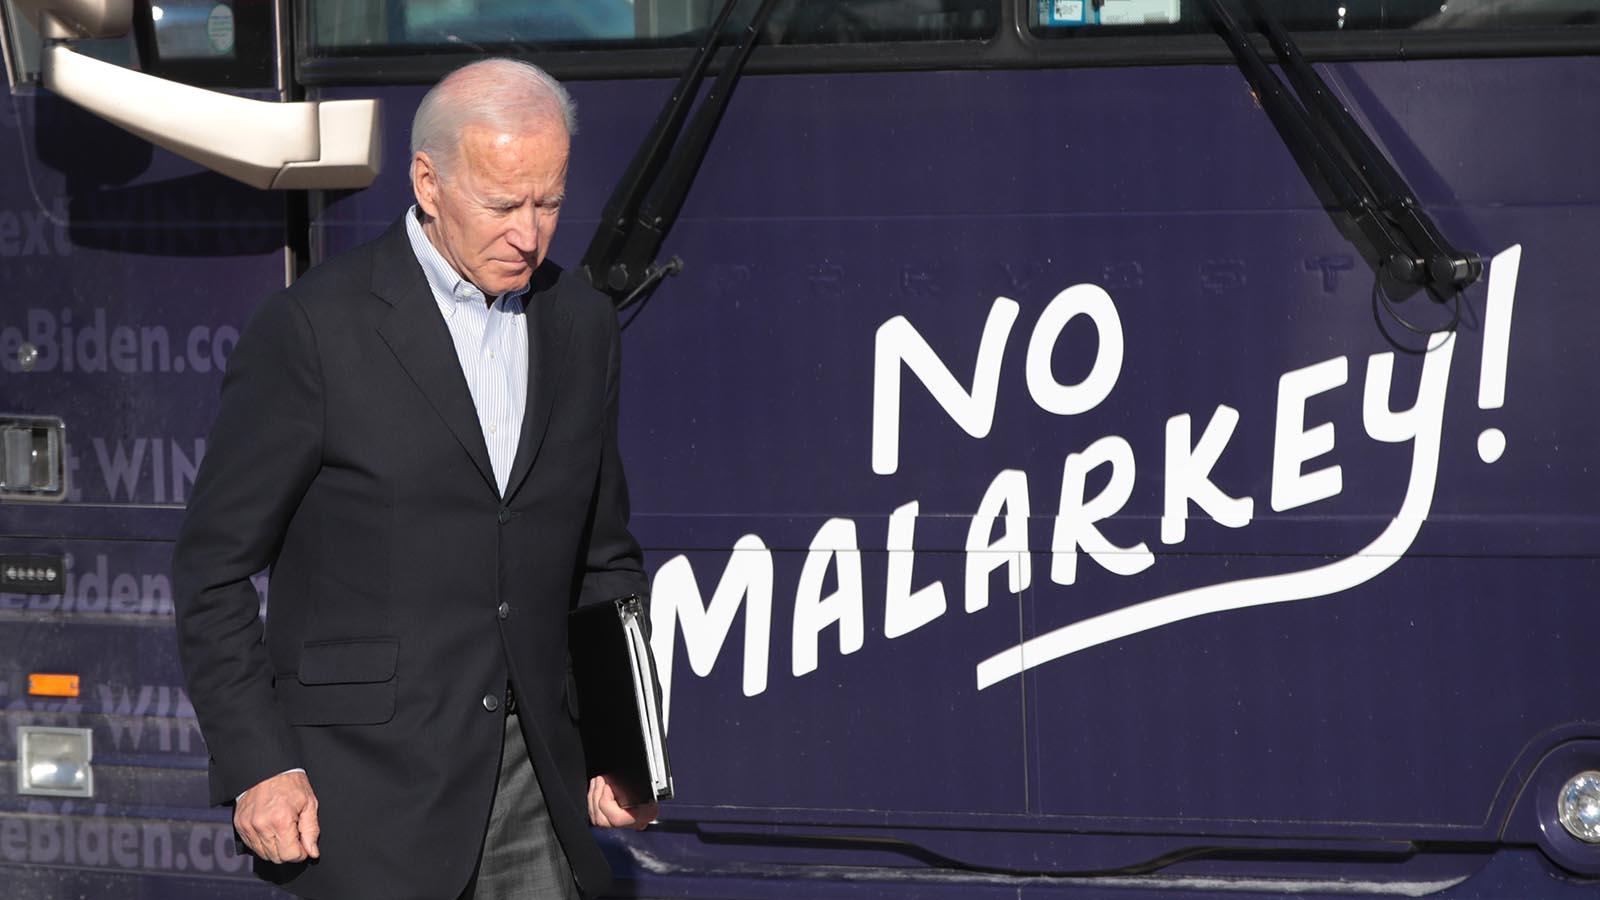 Malarkey: What's the Story Behind Joe Biden's Favorite Word?